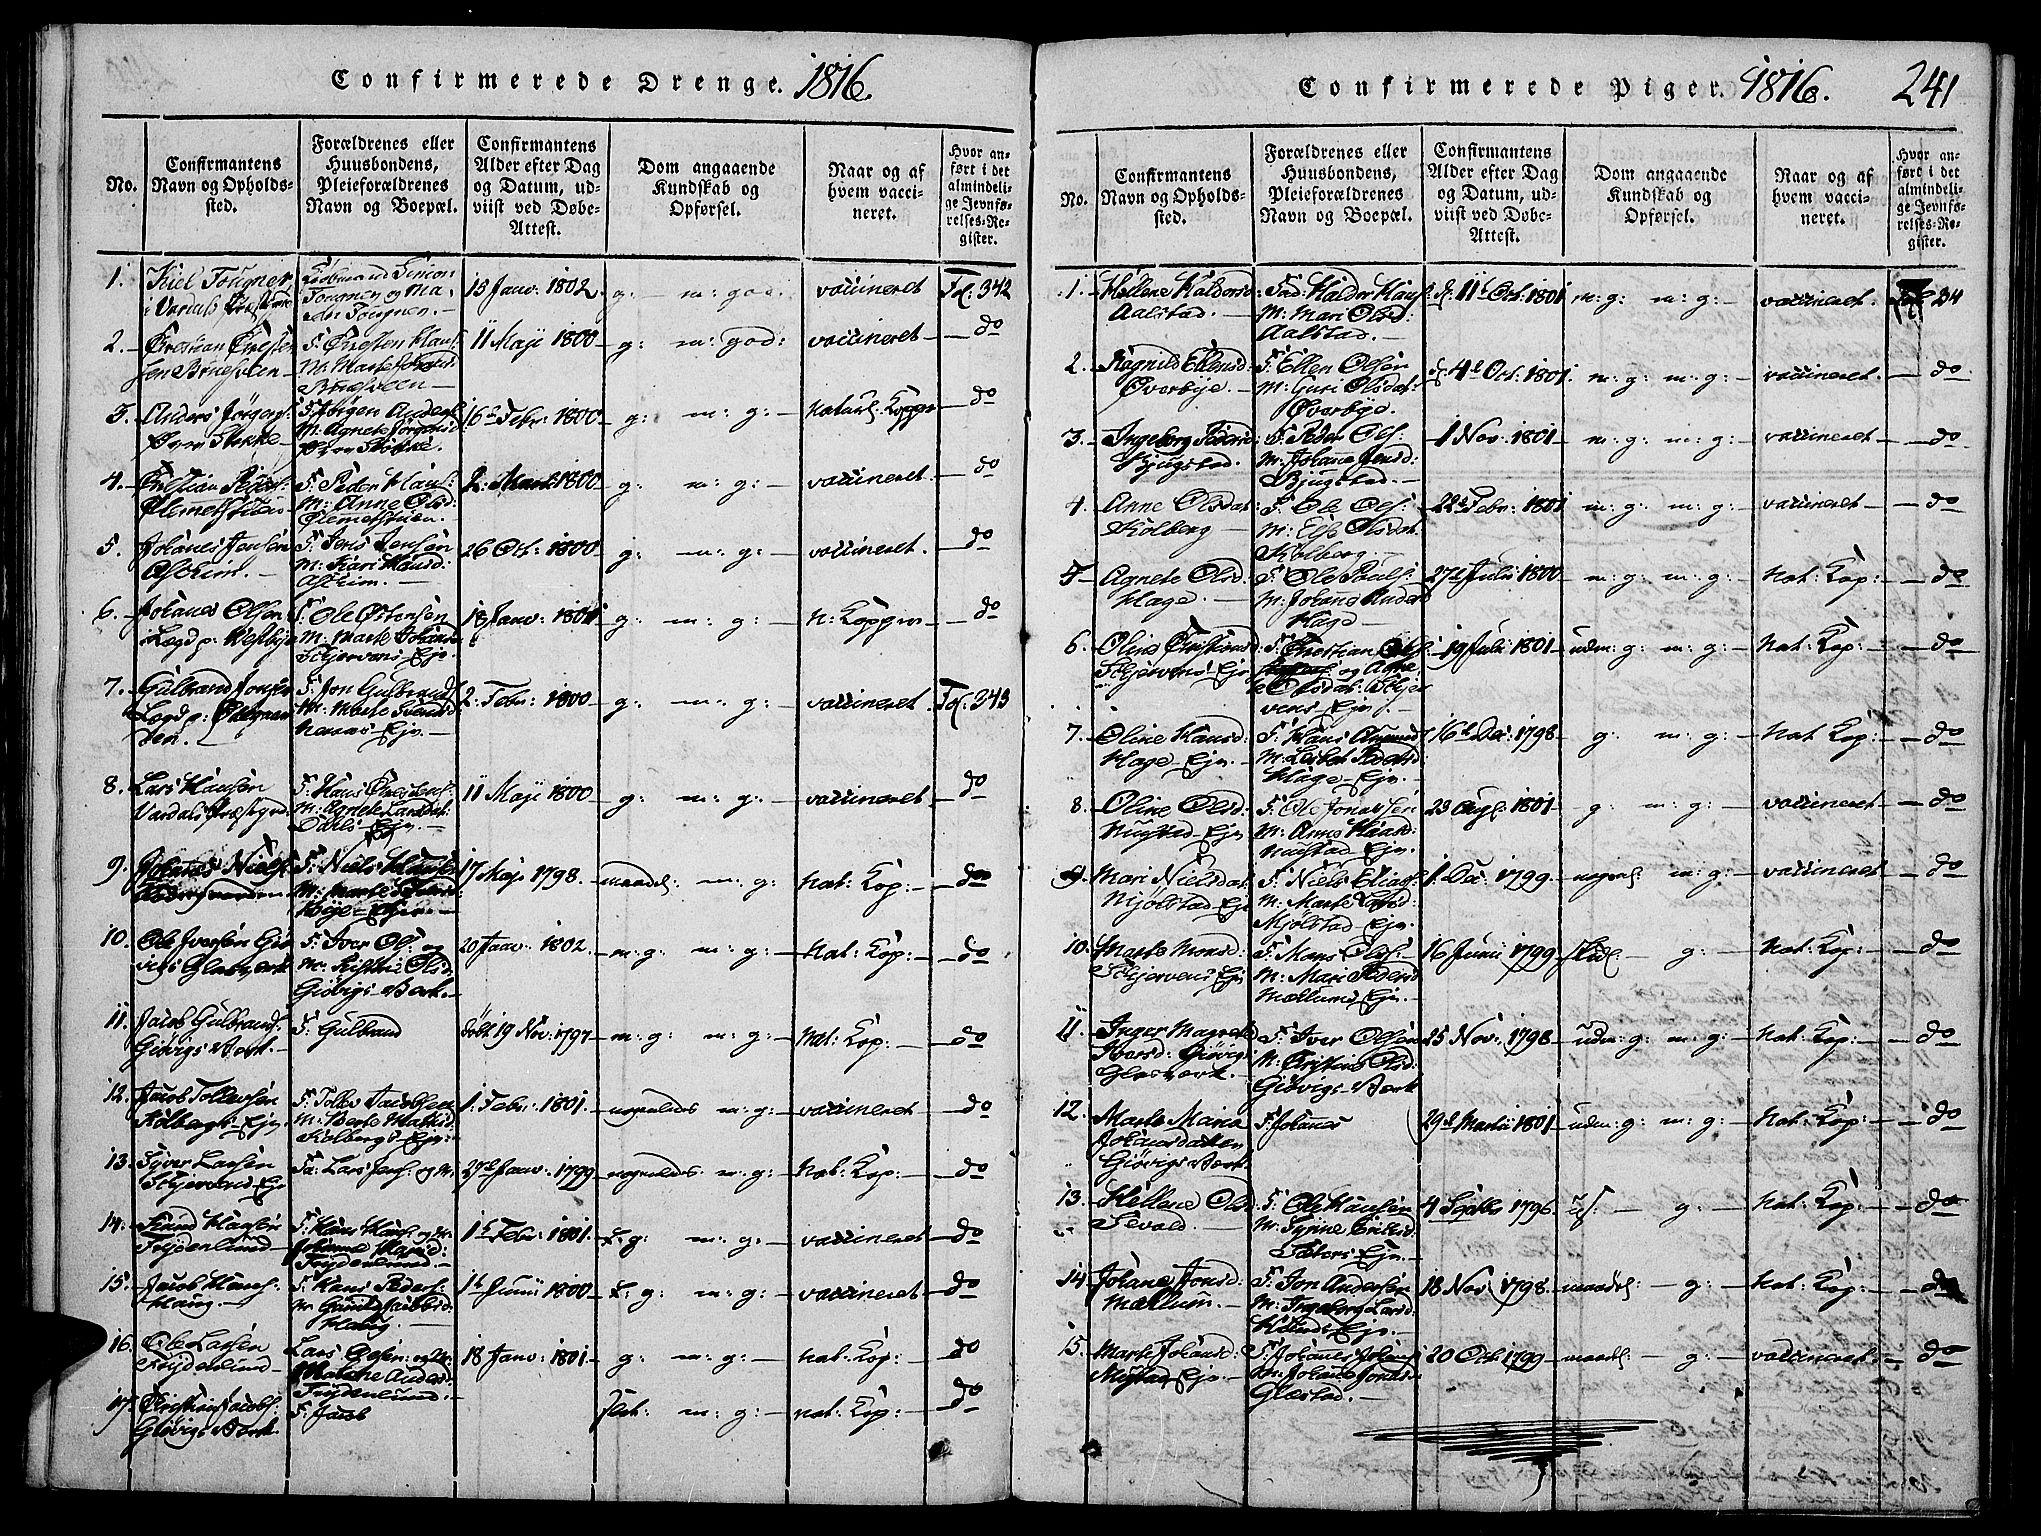 SAH, Vardal prestekontor, H/Ha/Haa/L0004: Ministerialbok nr. 4, 1814-1831, s. 241